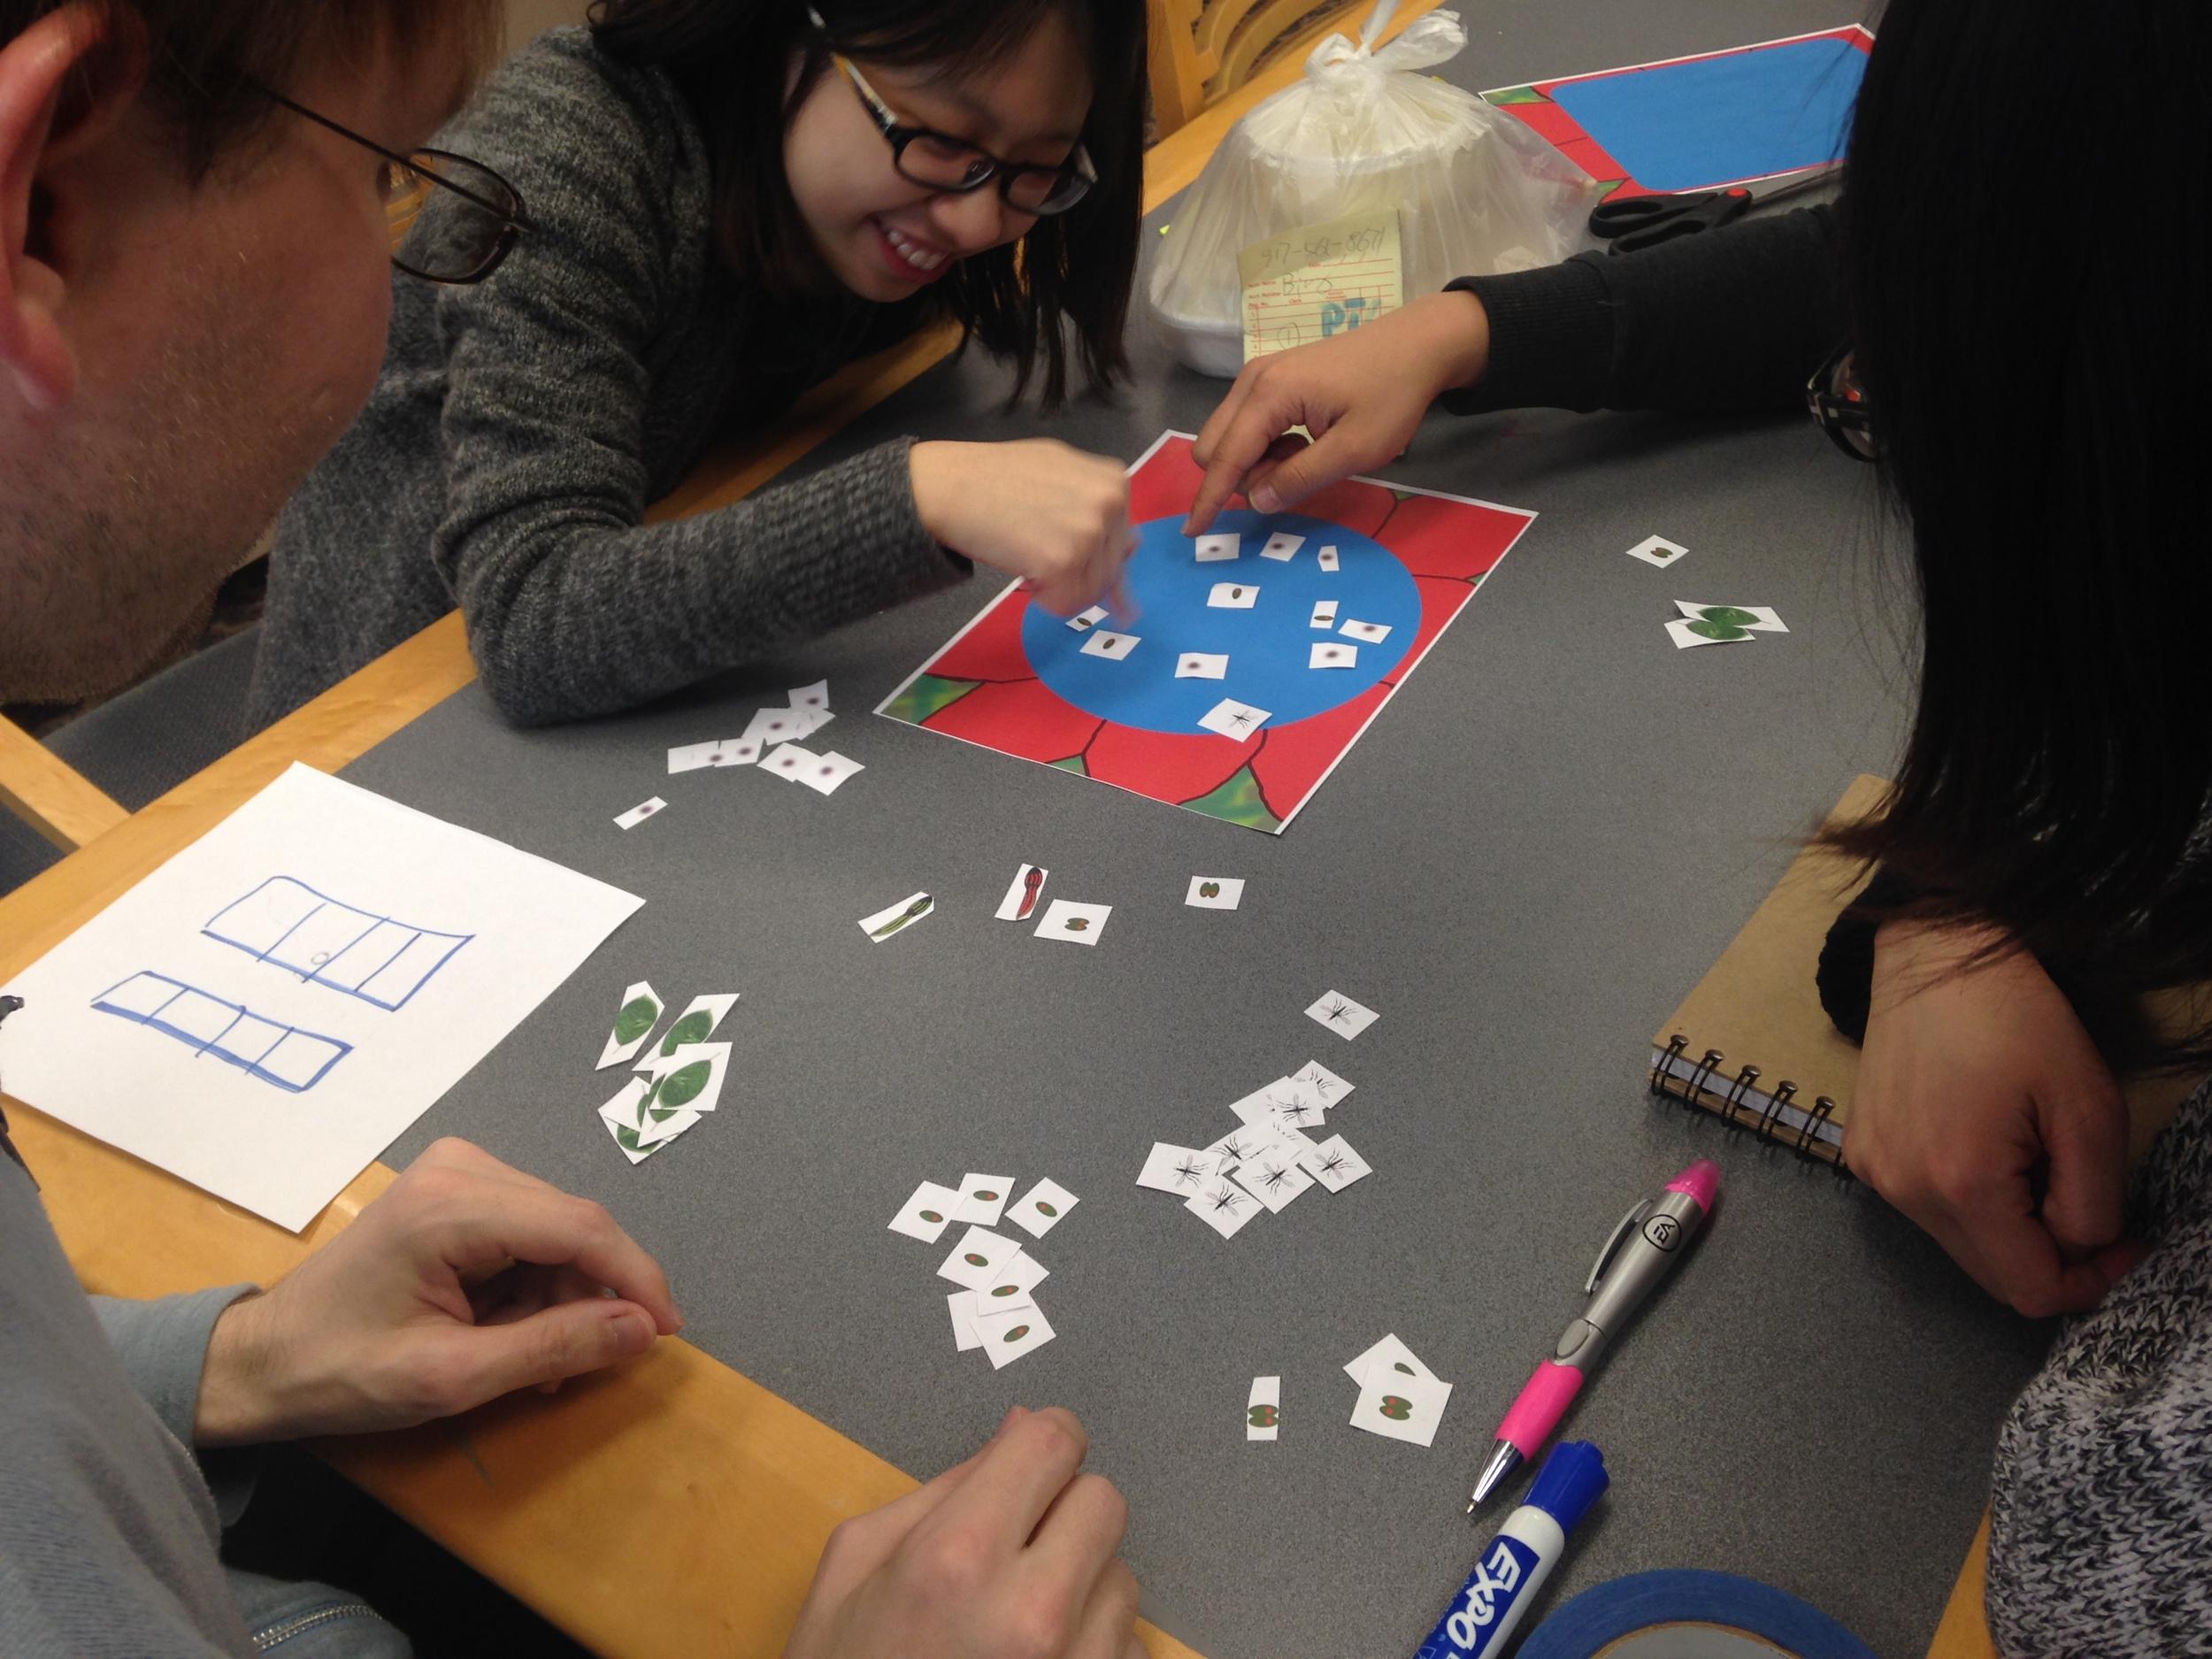 Team Gaia Paper Playtest